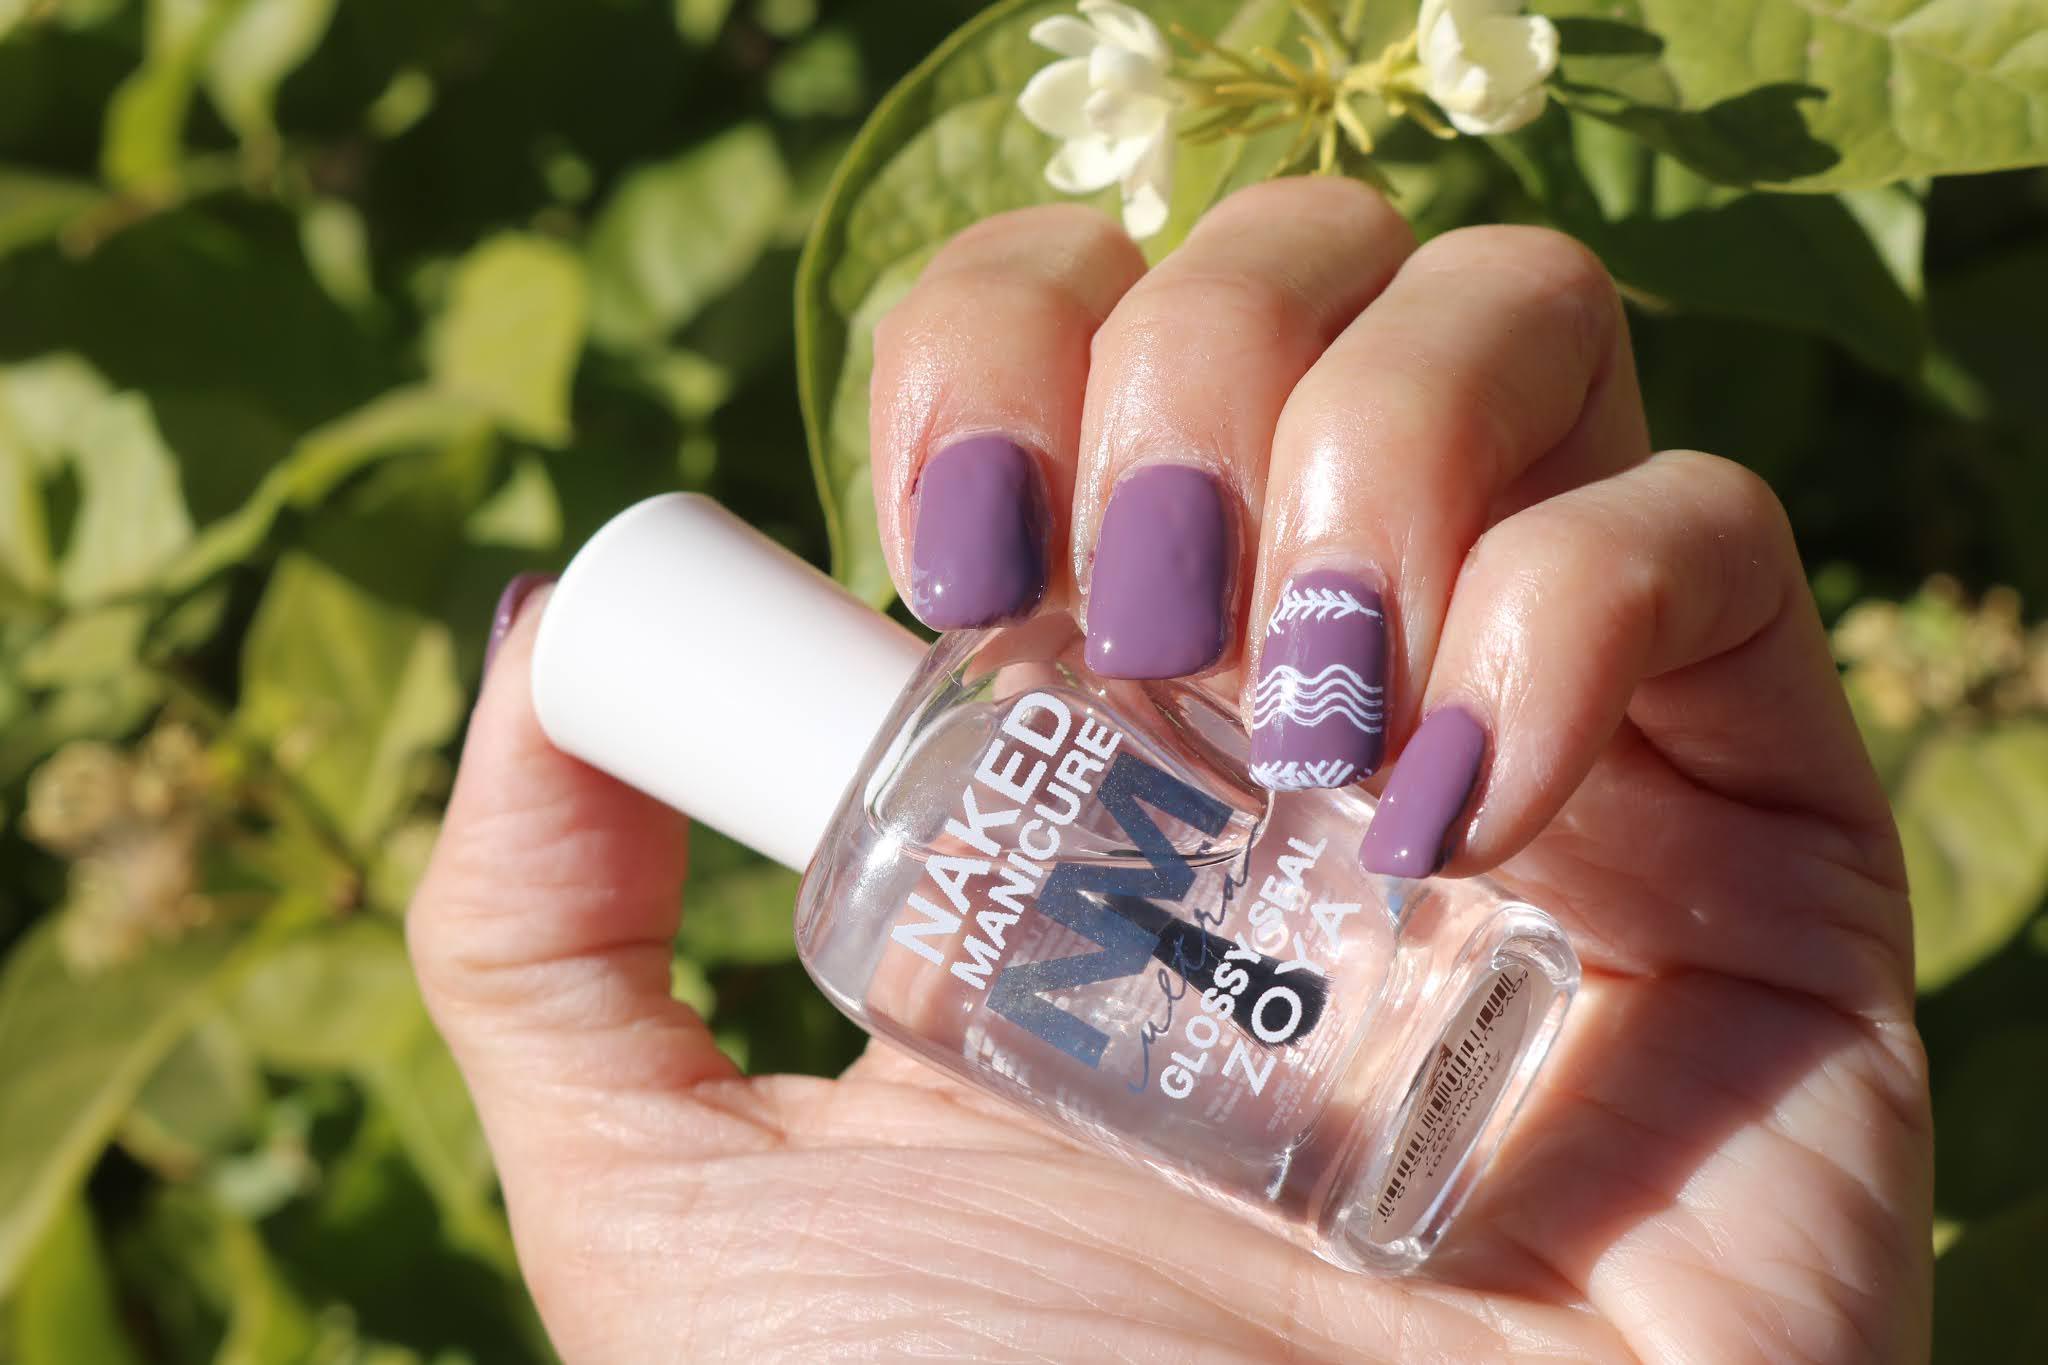 Zoya Naked Manicure Glossy Seal